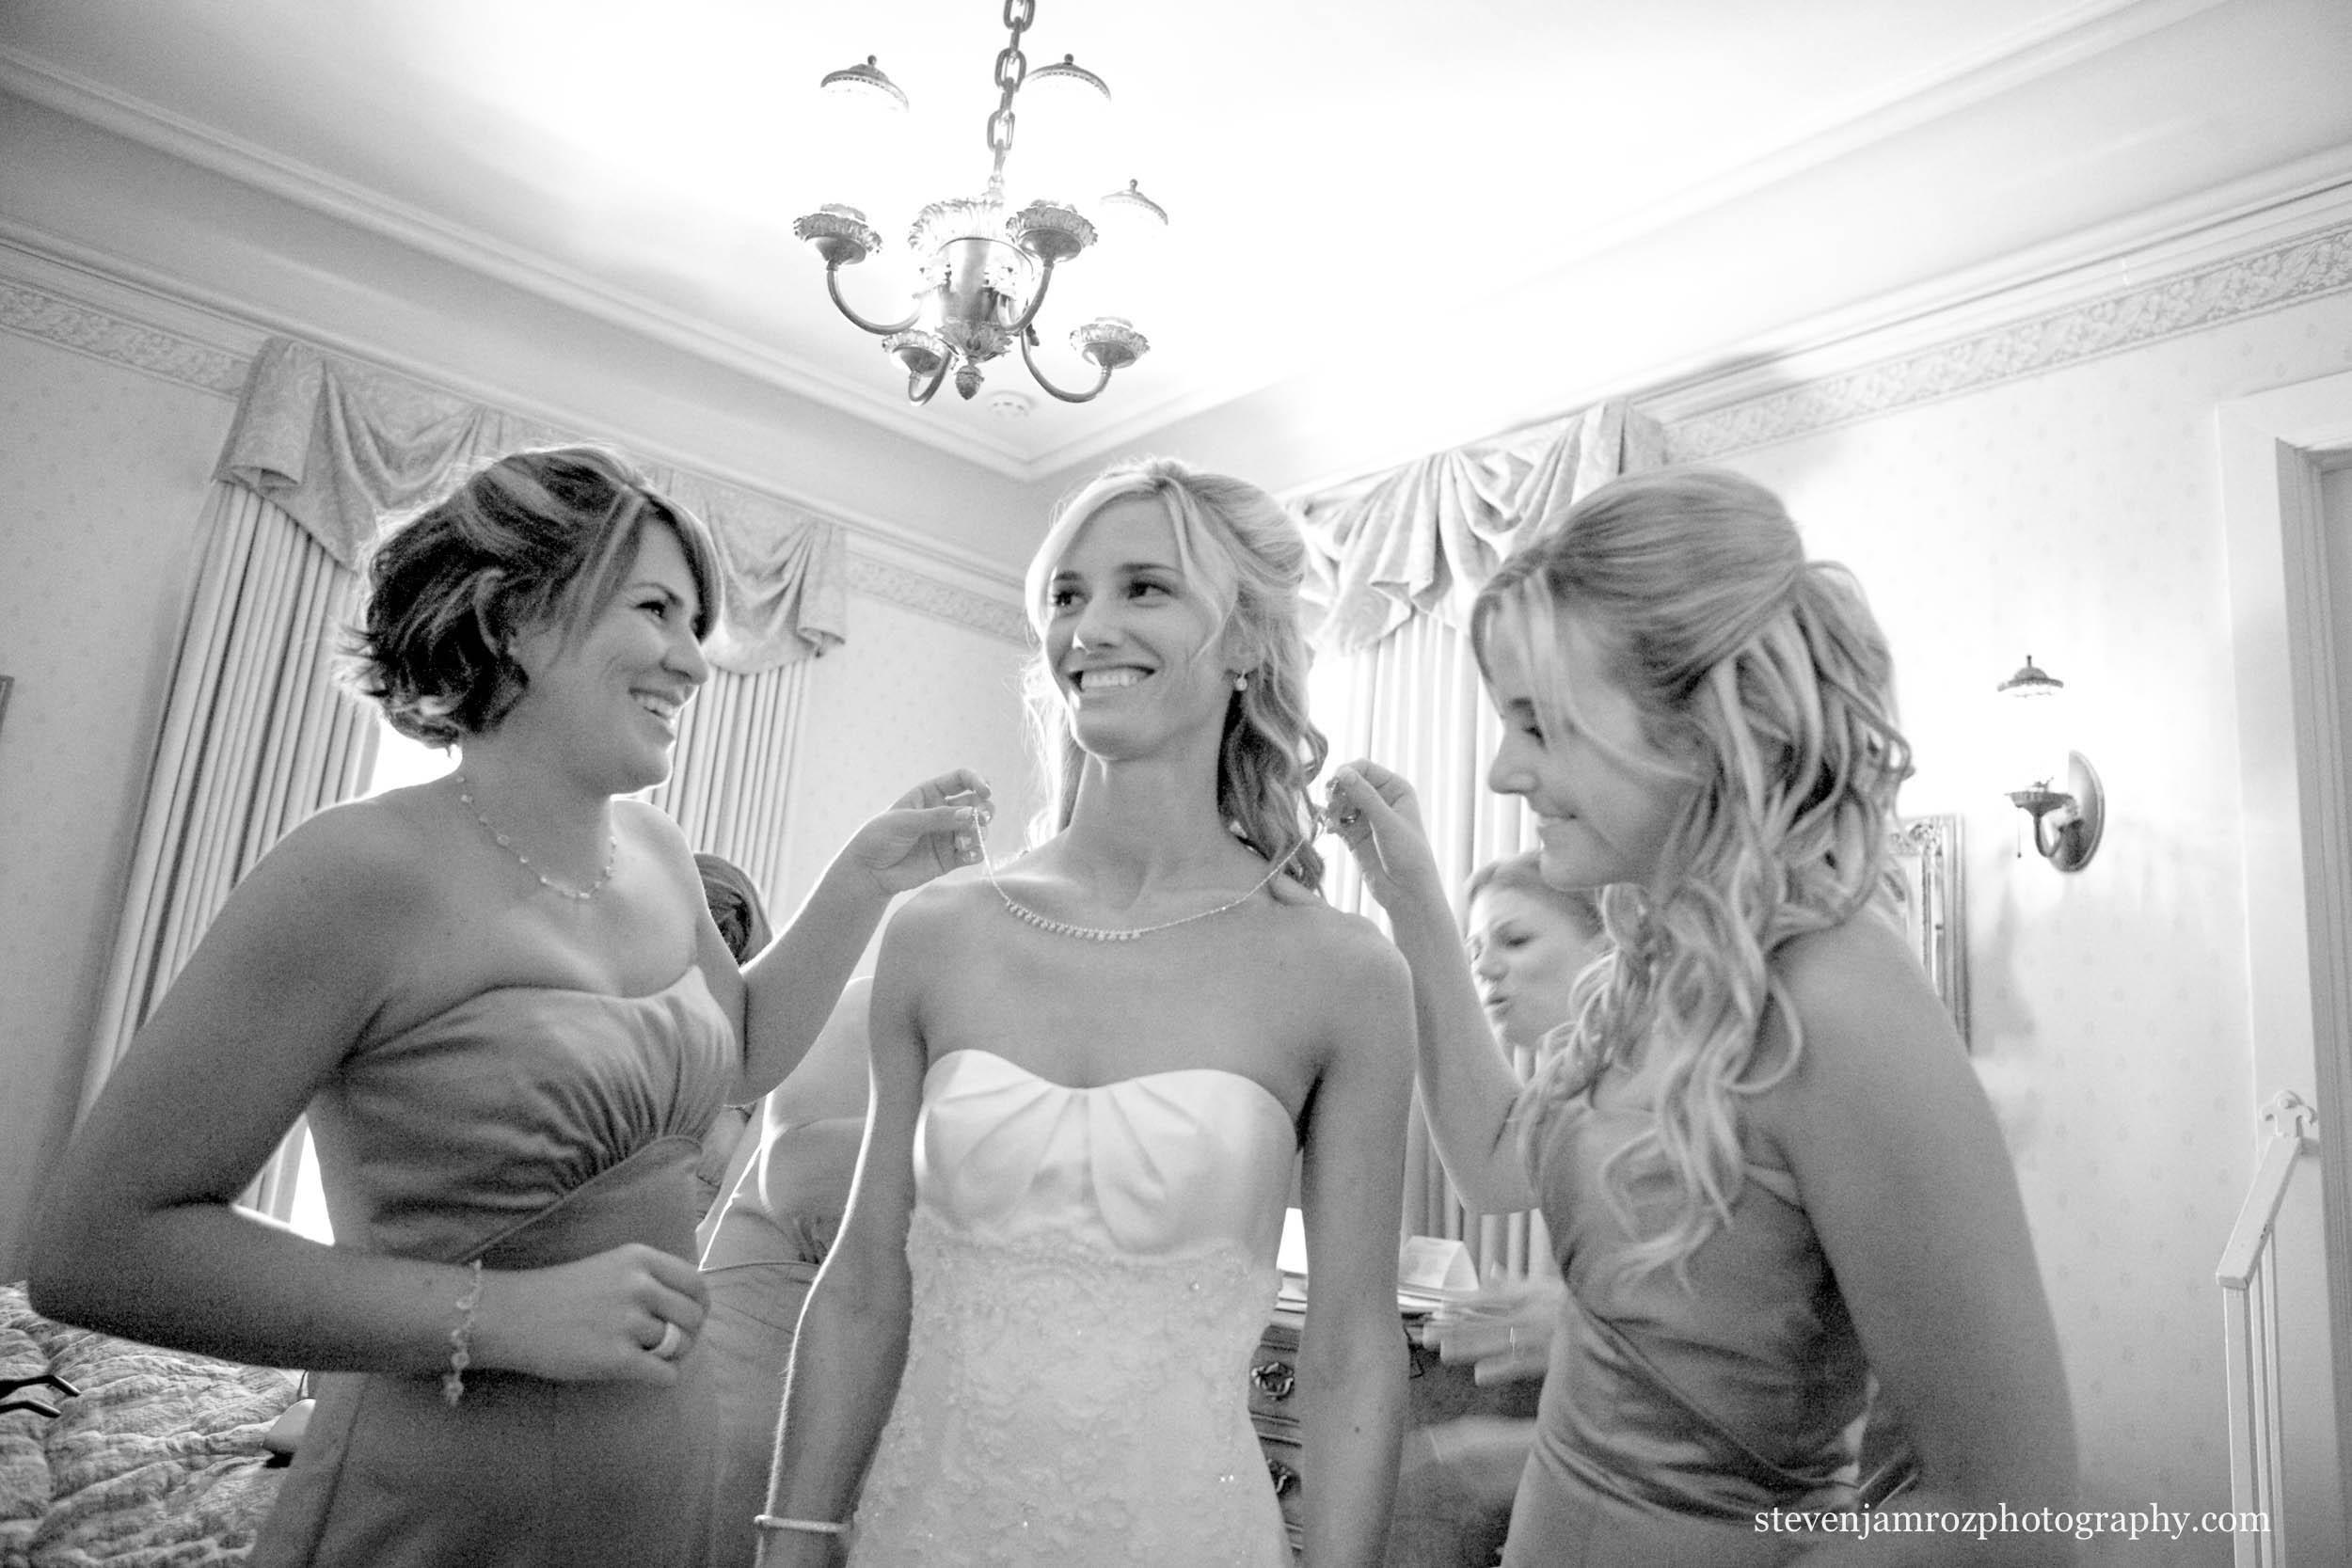 nc-wedding-raleigh-steven-jamroz-photography-0554.jpg